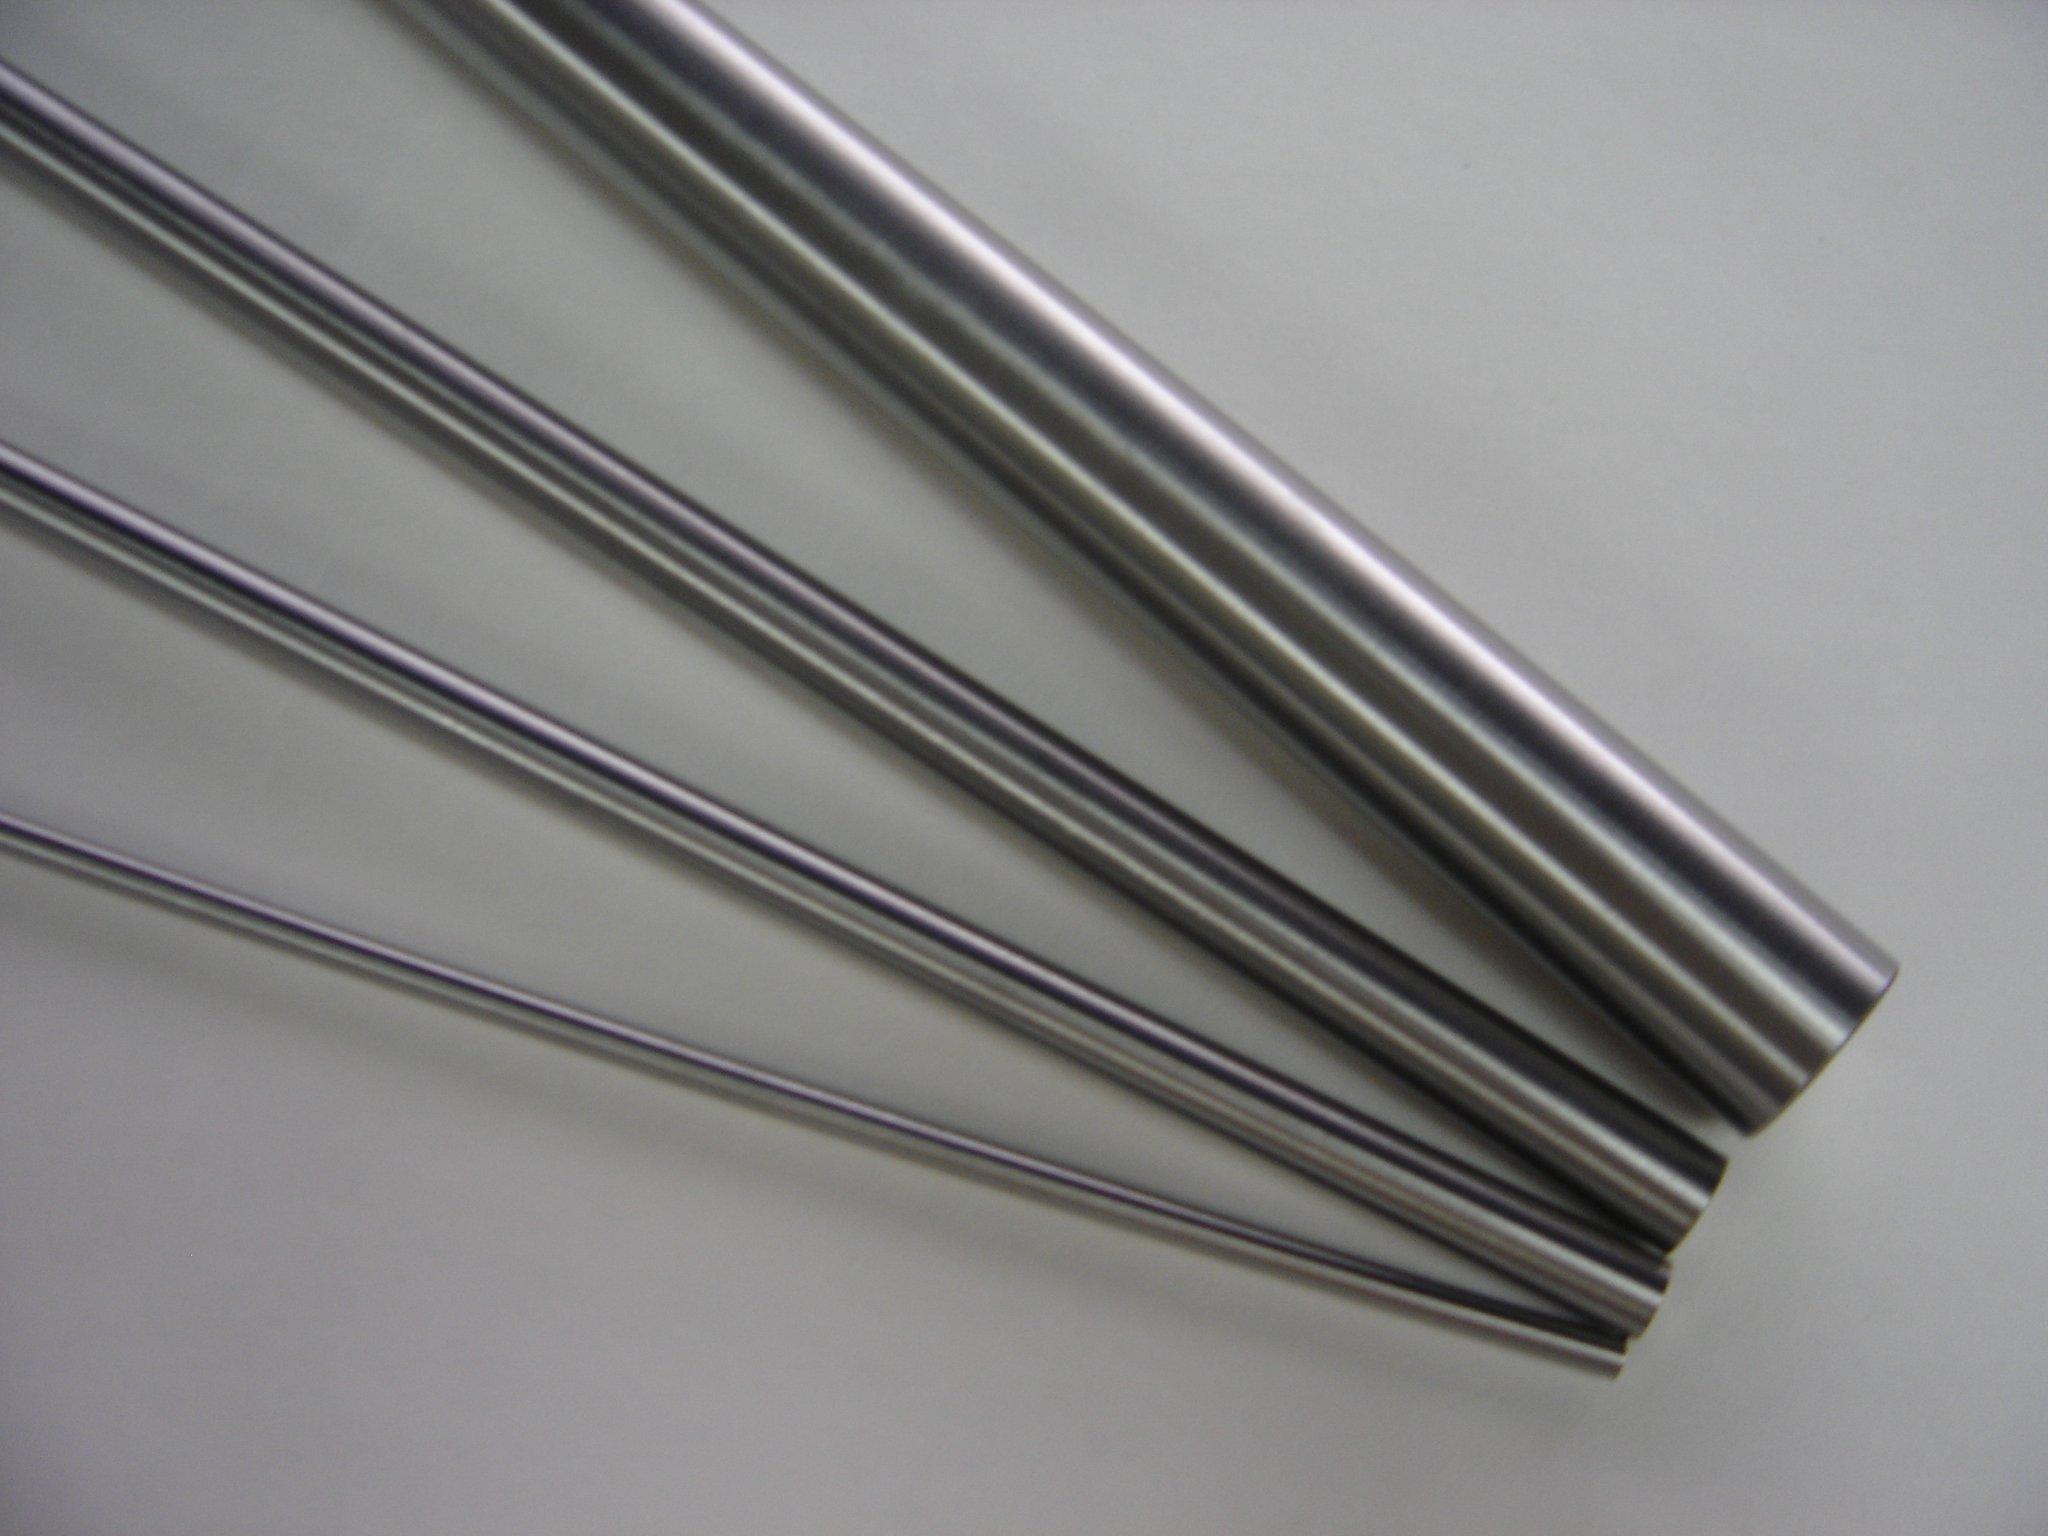 Moly Molybdenum Rod 0.375'' Diameter X 12'' Length, Unpolished by Torrey Hills Technologies